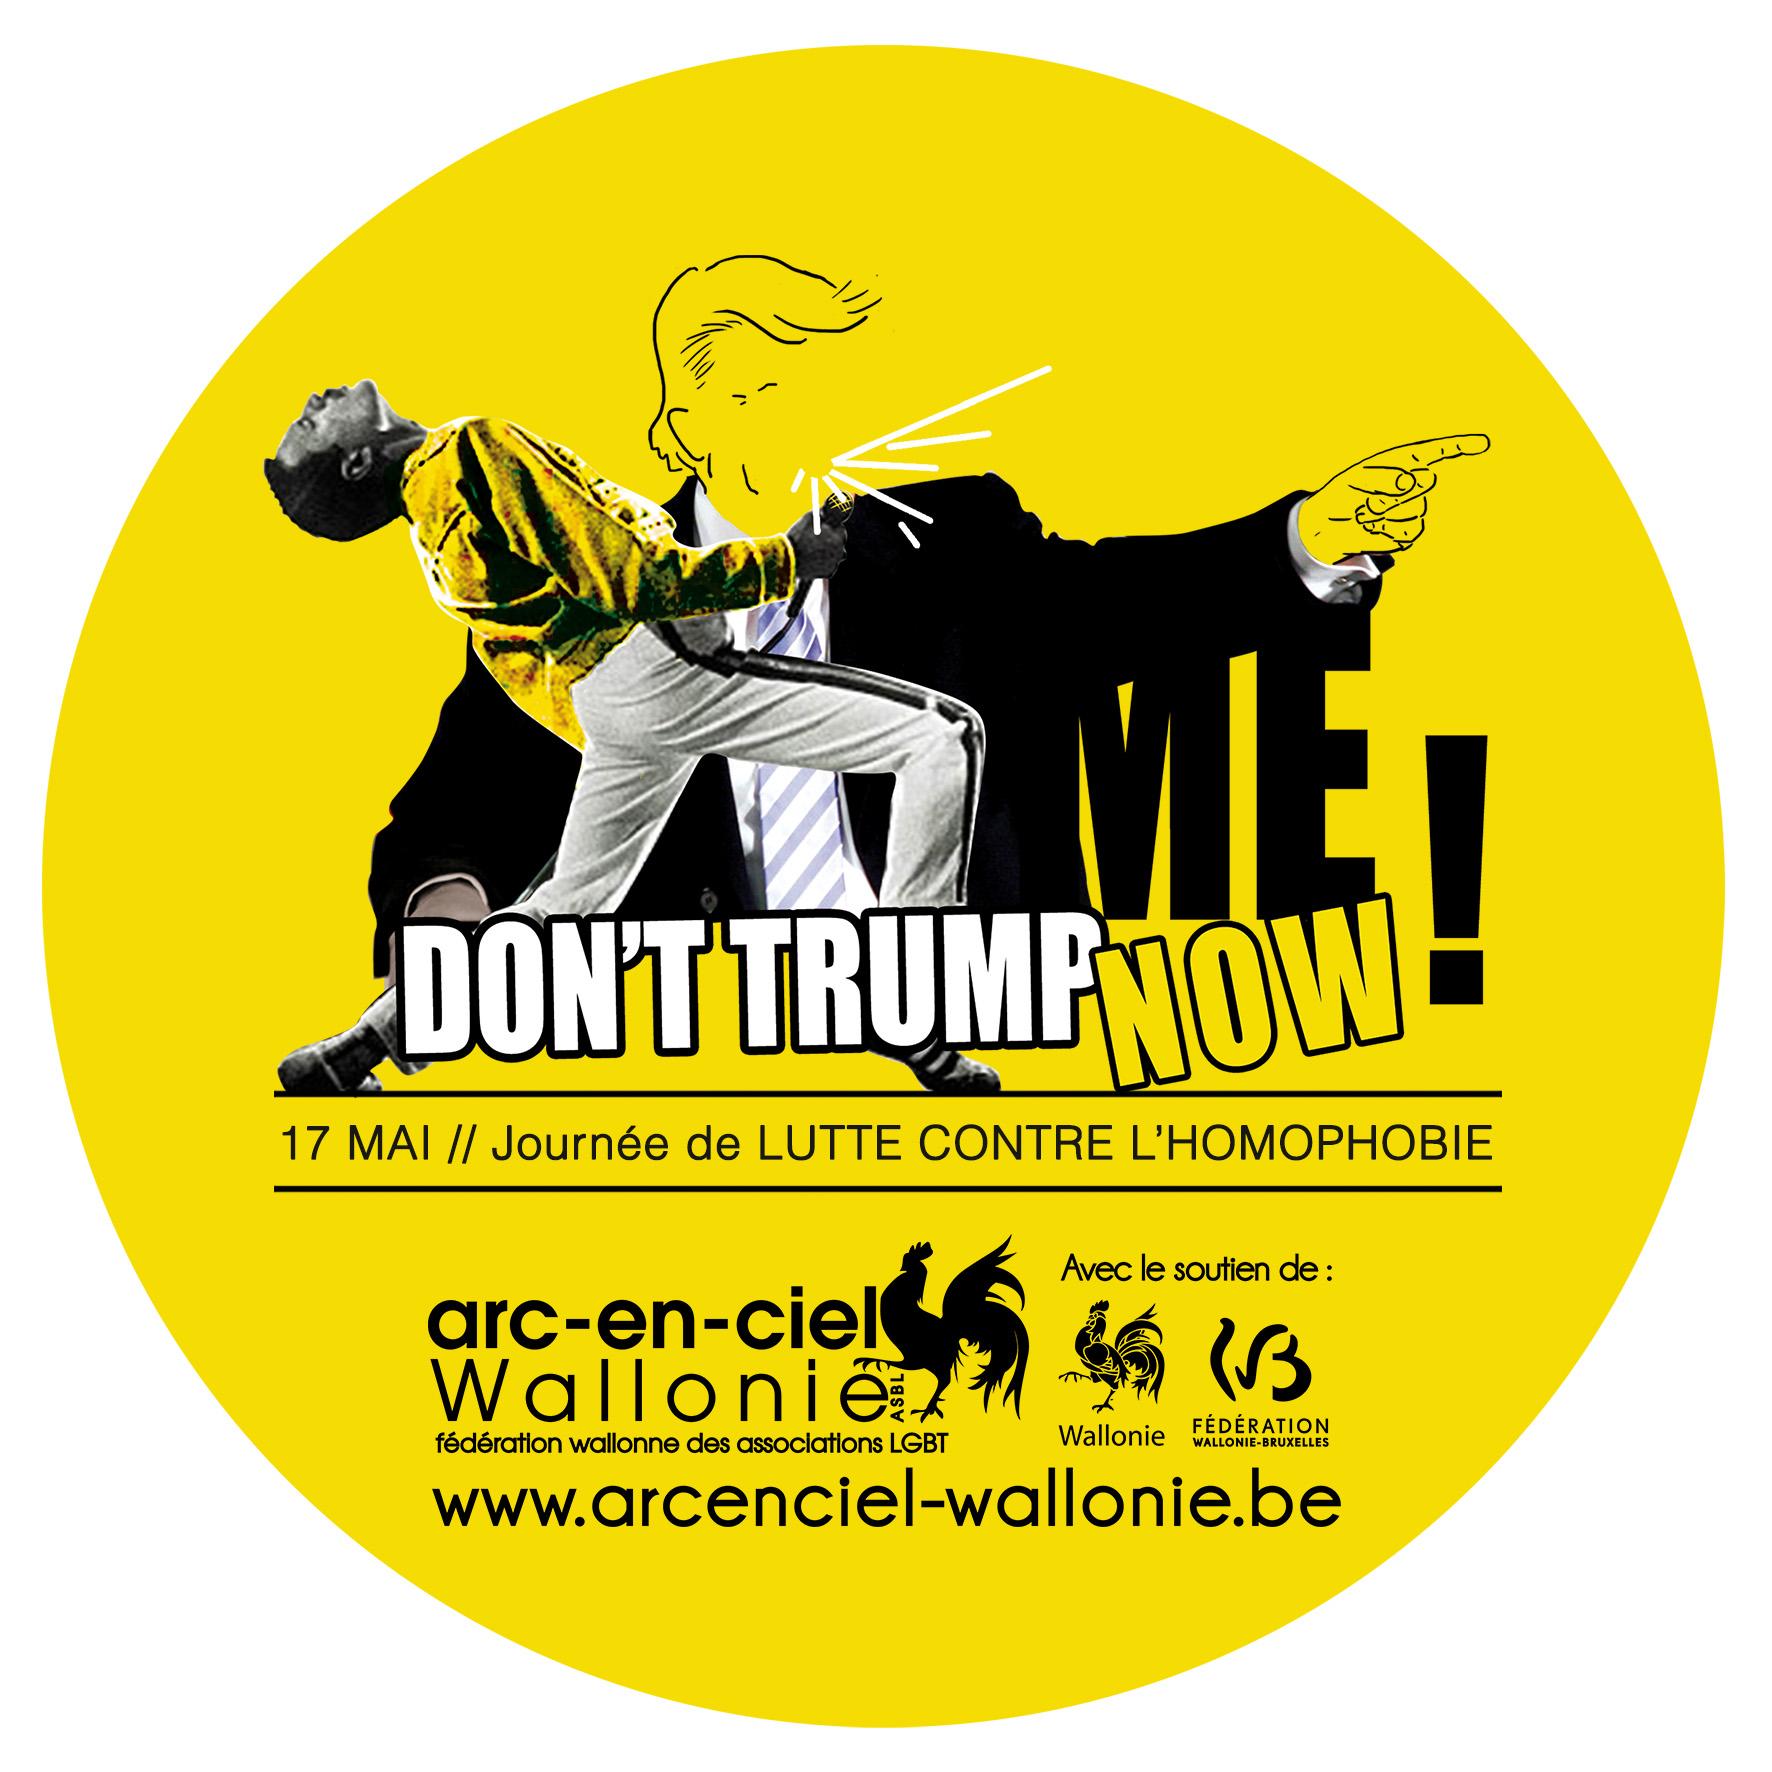 DONTTRUMPME-Campagne-ARC-EN-CIEL-AngiePir